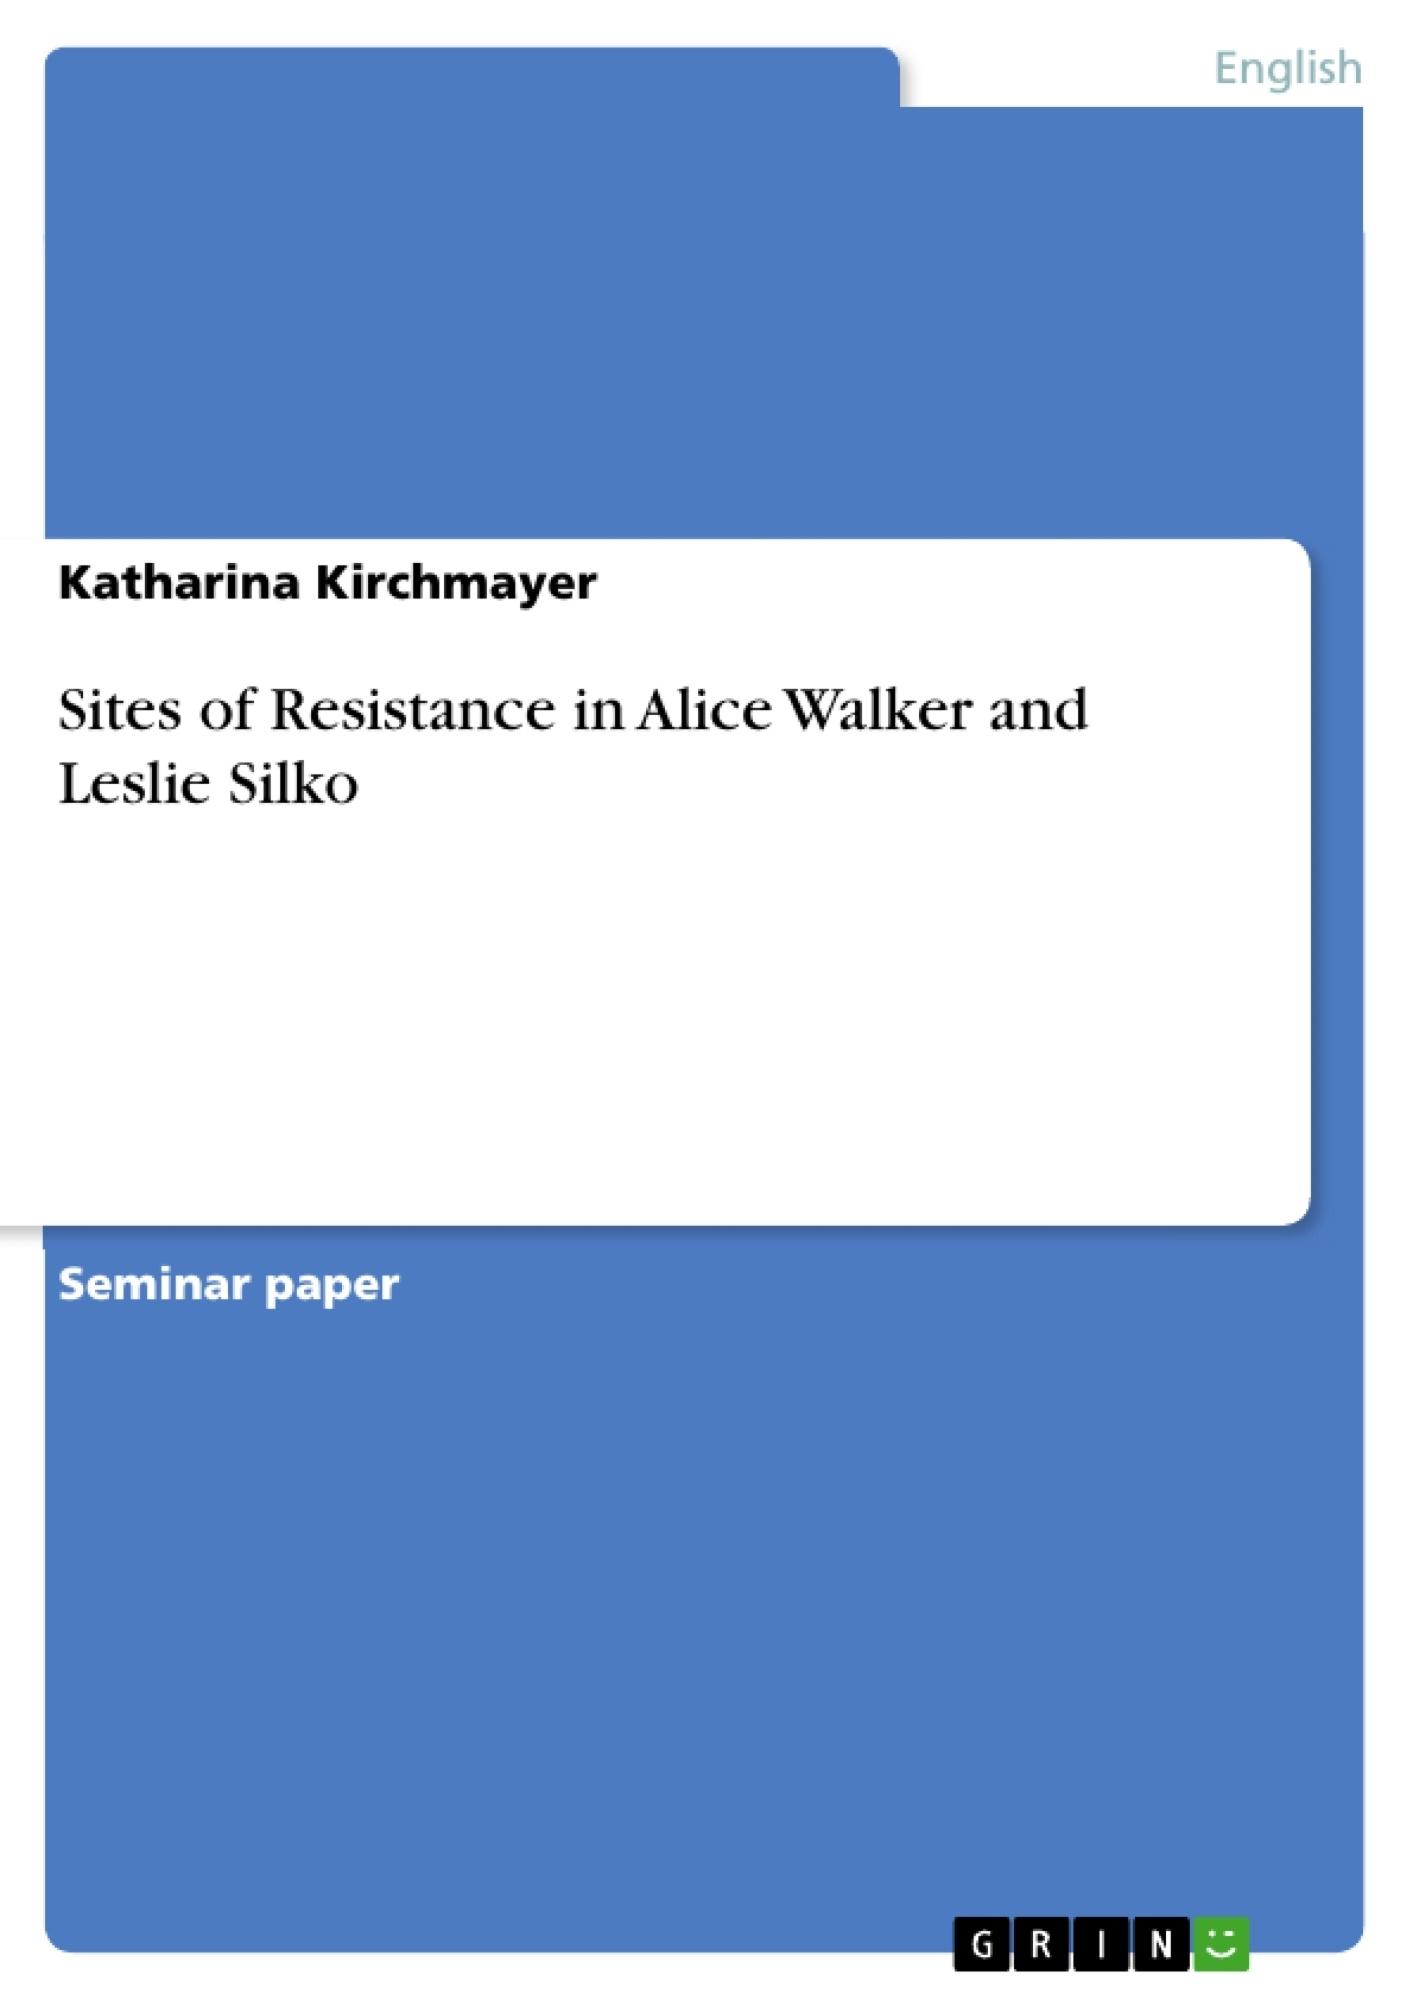 Title: Sites of Resistance in Alice Walker and Leslie Silko